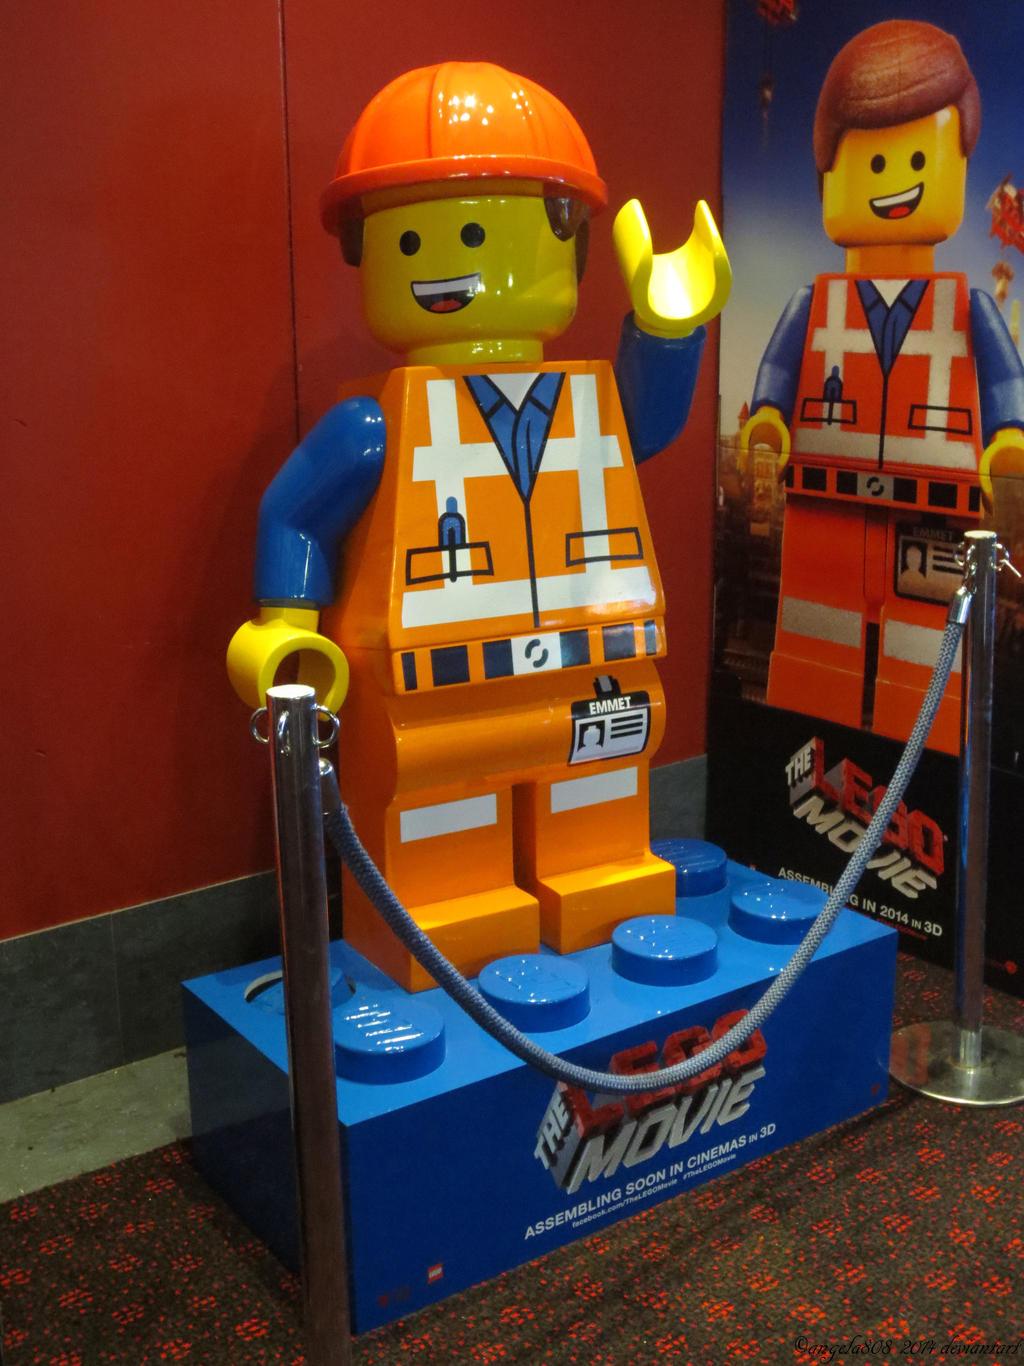 THE LEGO MOVIE Emmet Brickowski by angela808 on DeviantArt